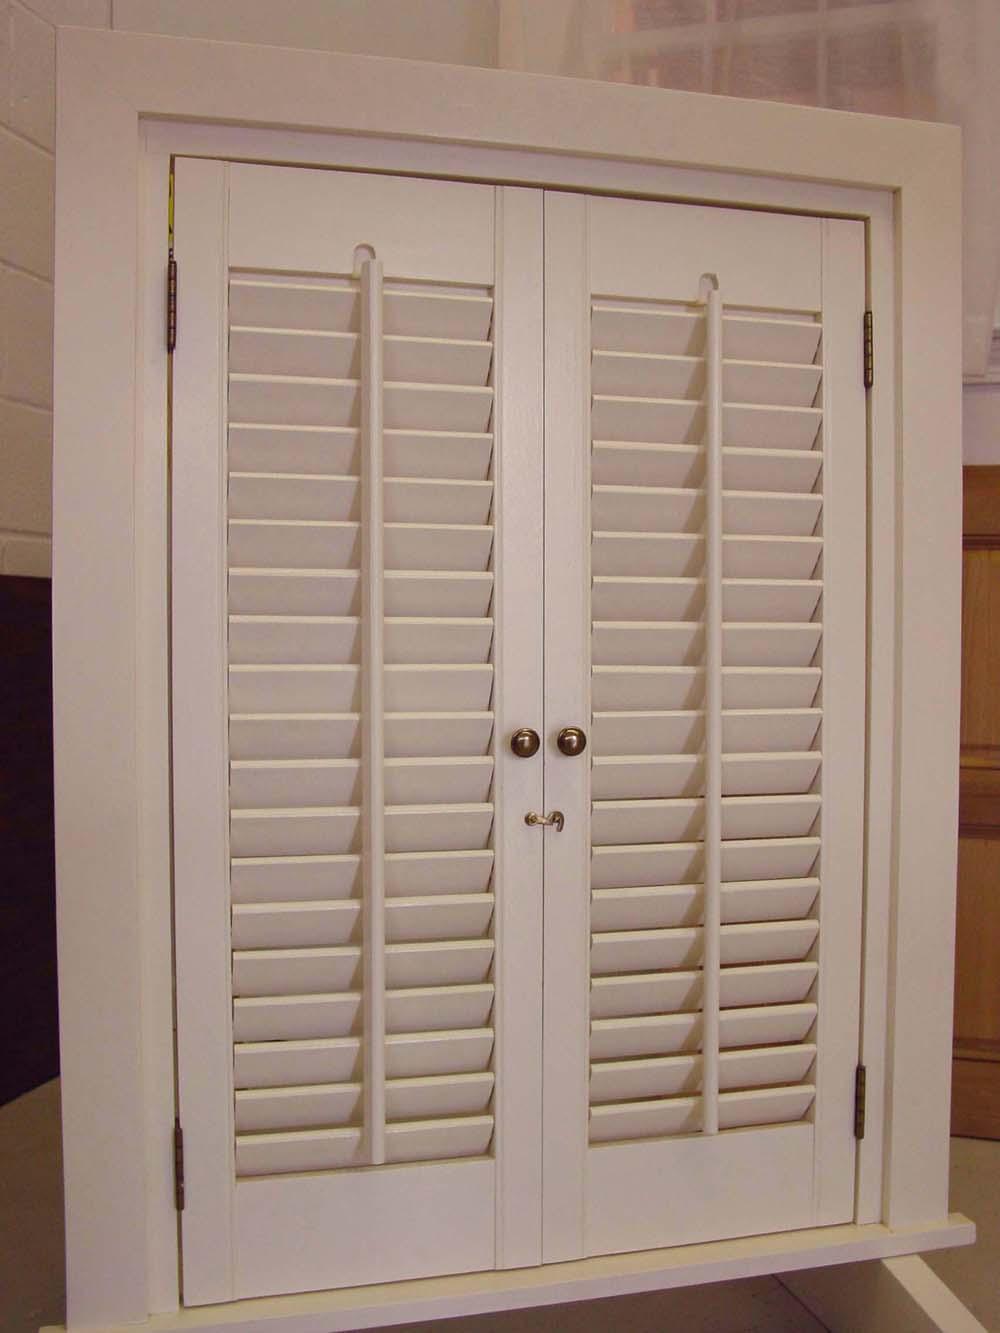 Shuttercraft interior shutters - Unfinished interior wood shutters ...